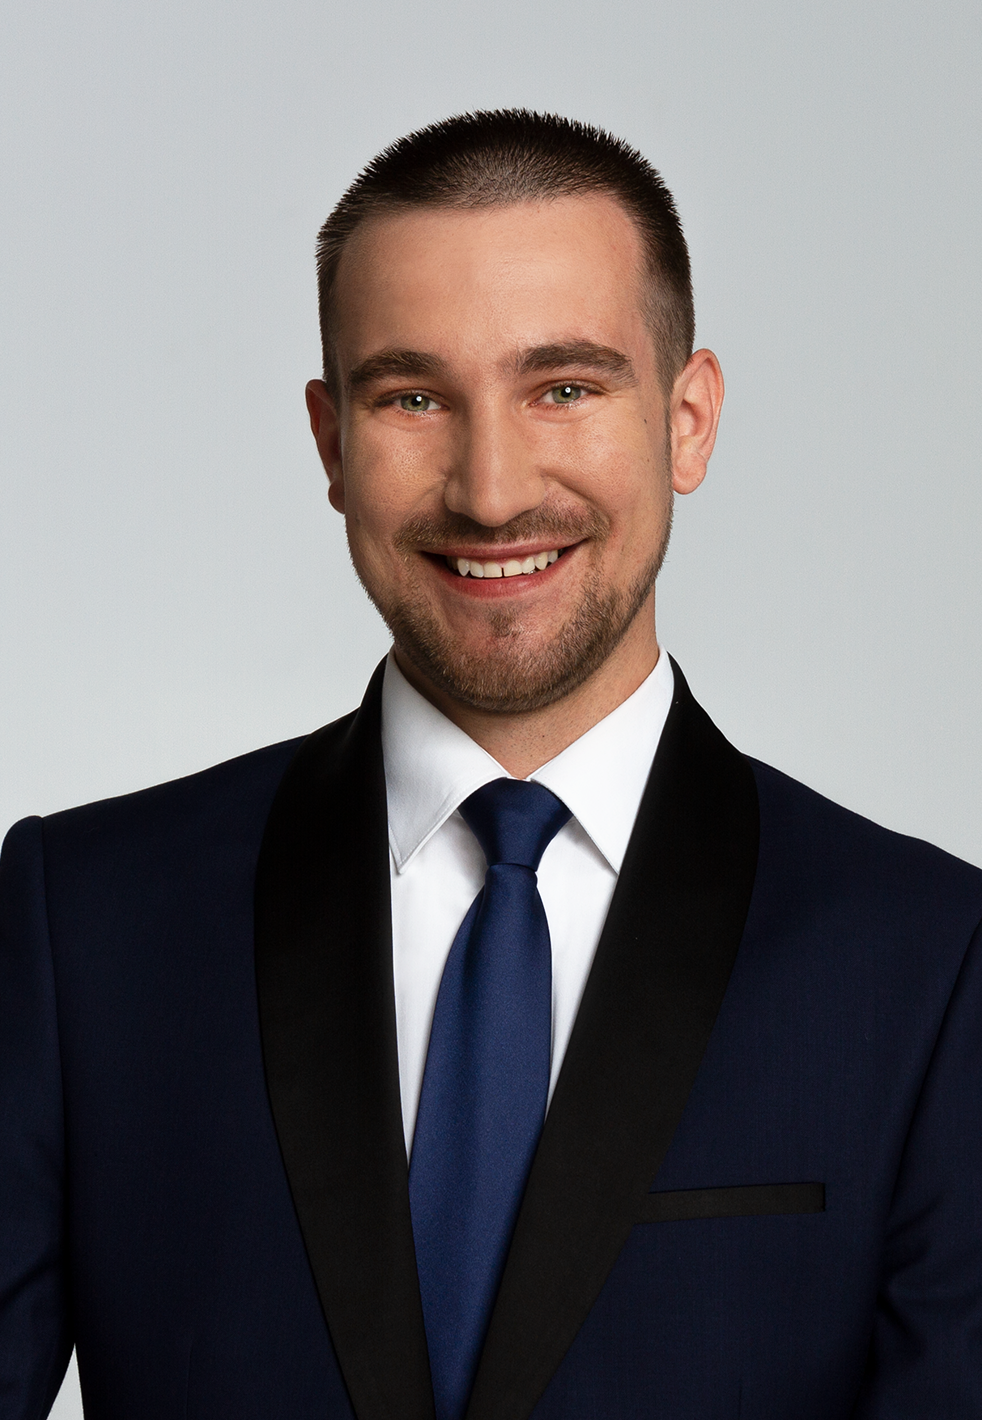 Sebastian Dylewski